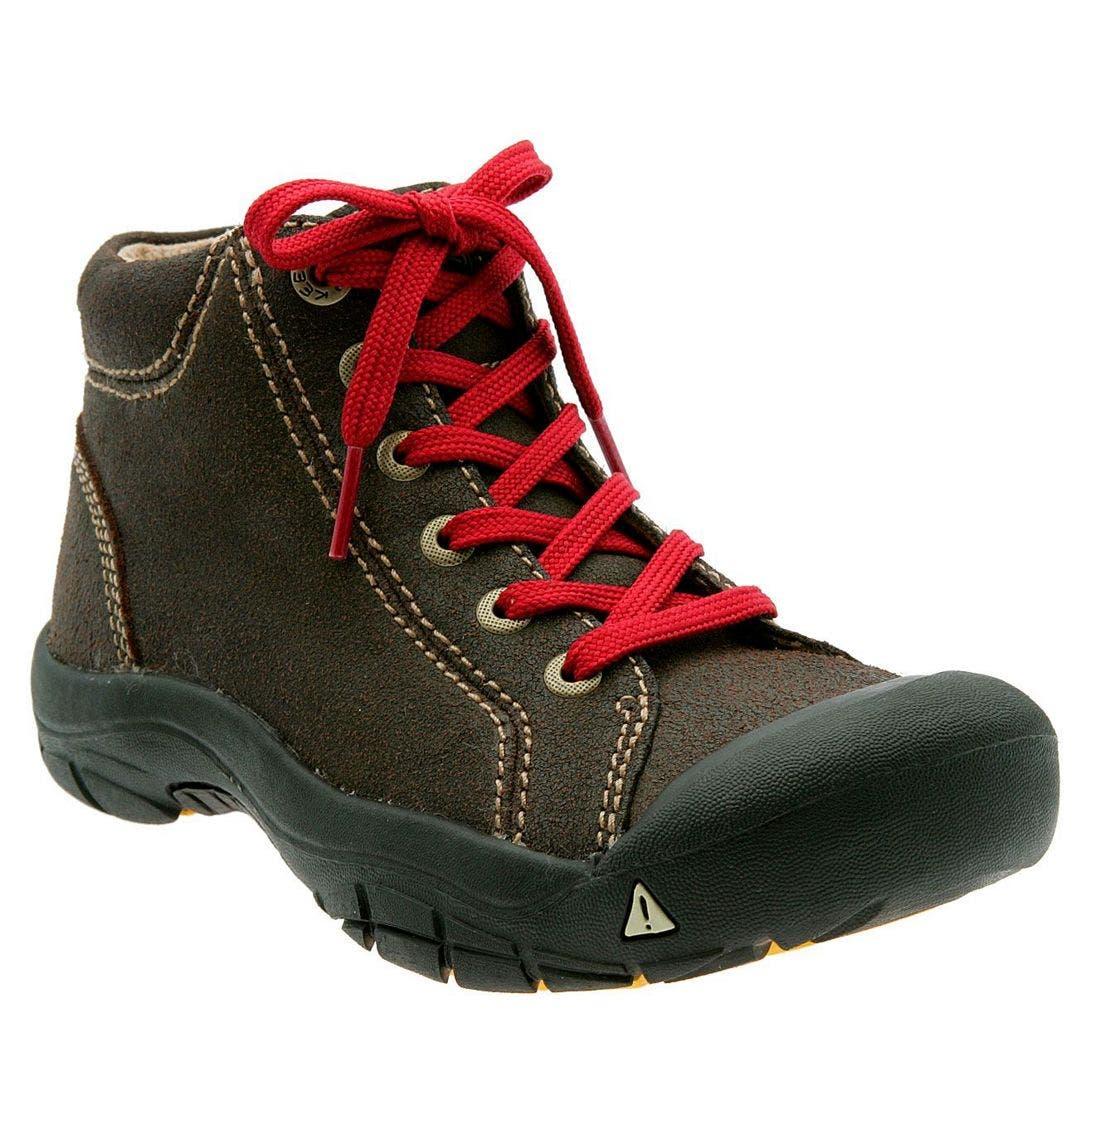 KEEN 'Briggs' Mid Boot, Main, color, DBR